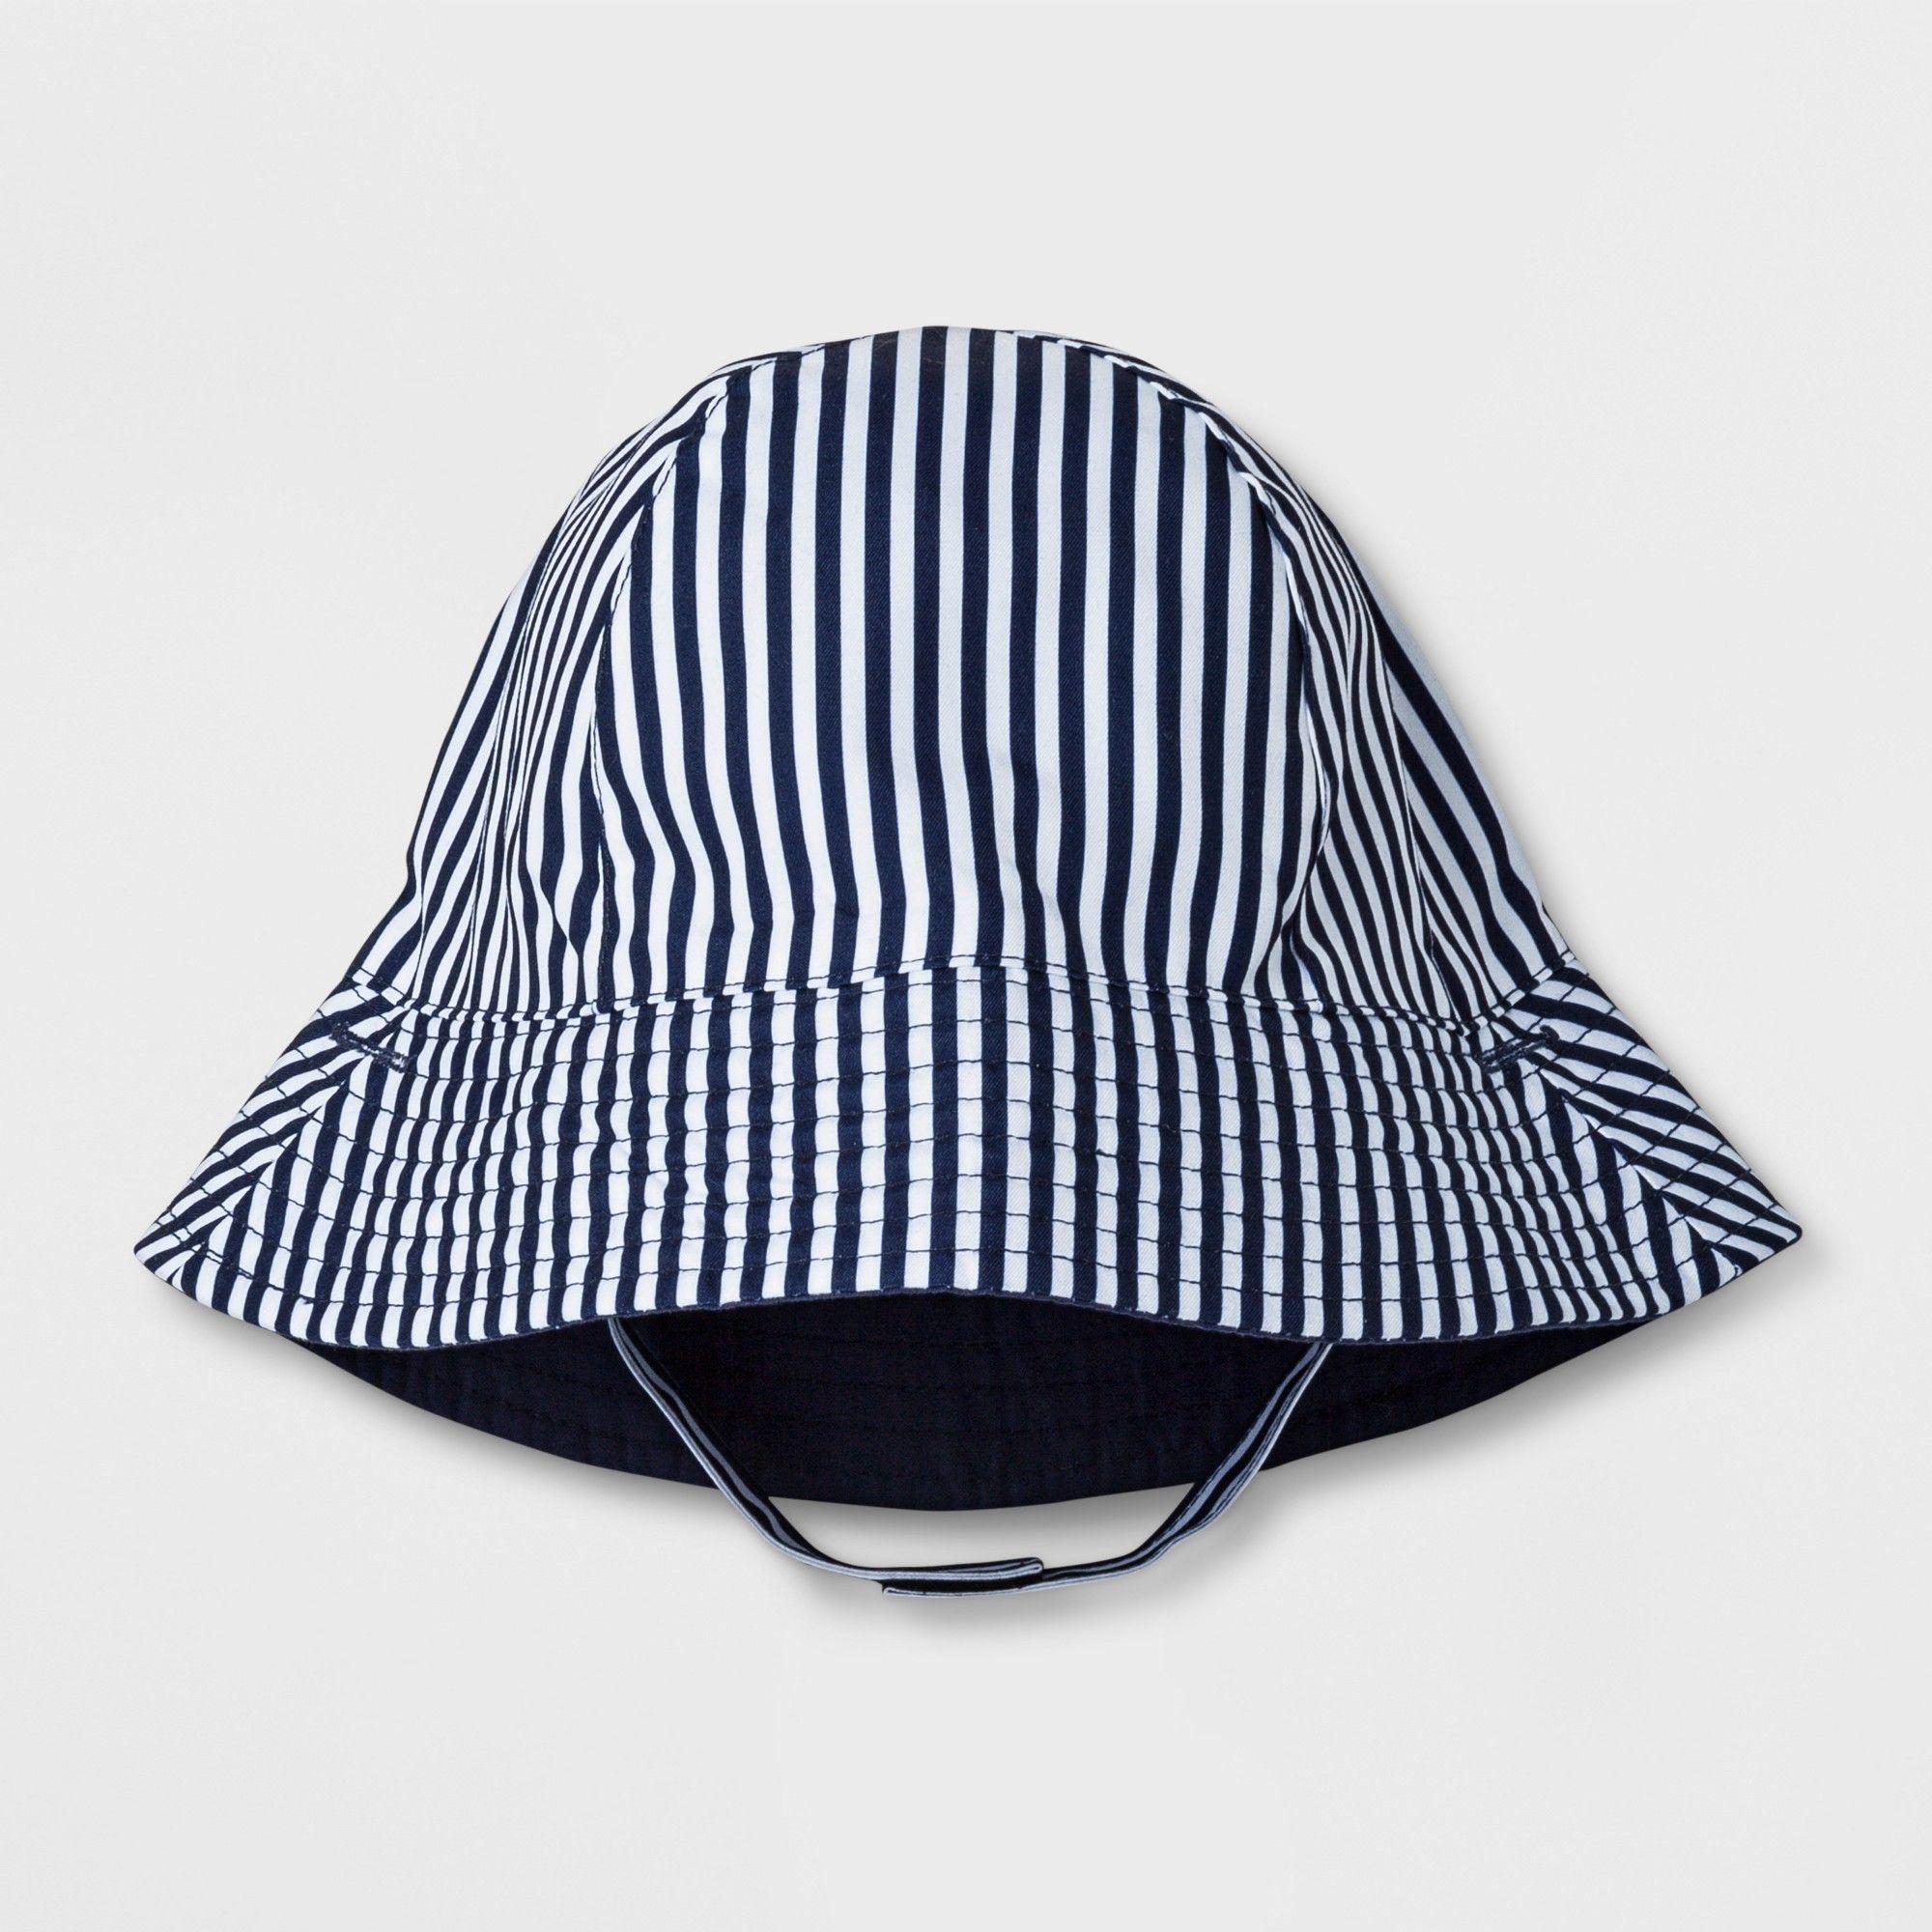 980d682ab858 ... ebay toddler boys stripe bucket hat cat jack navy blue 12 18m a2553  64b8c